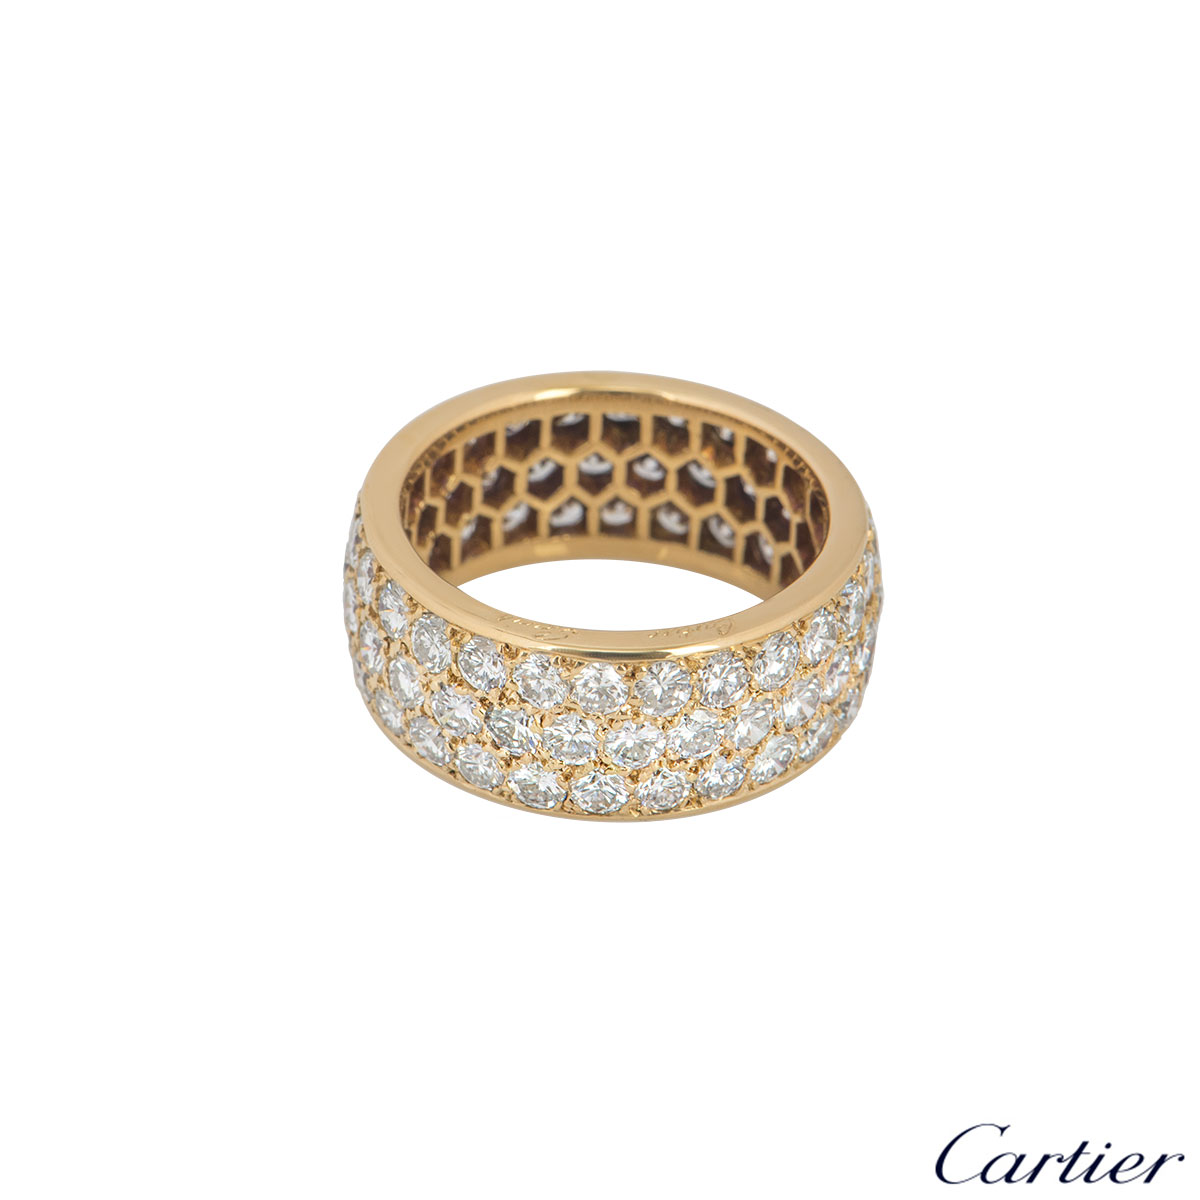 Cartier Yellow Gold Diamond Full Eternity Ring 3.60ct G/VS